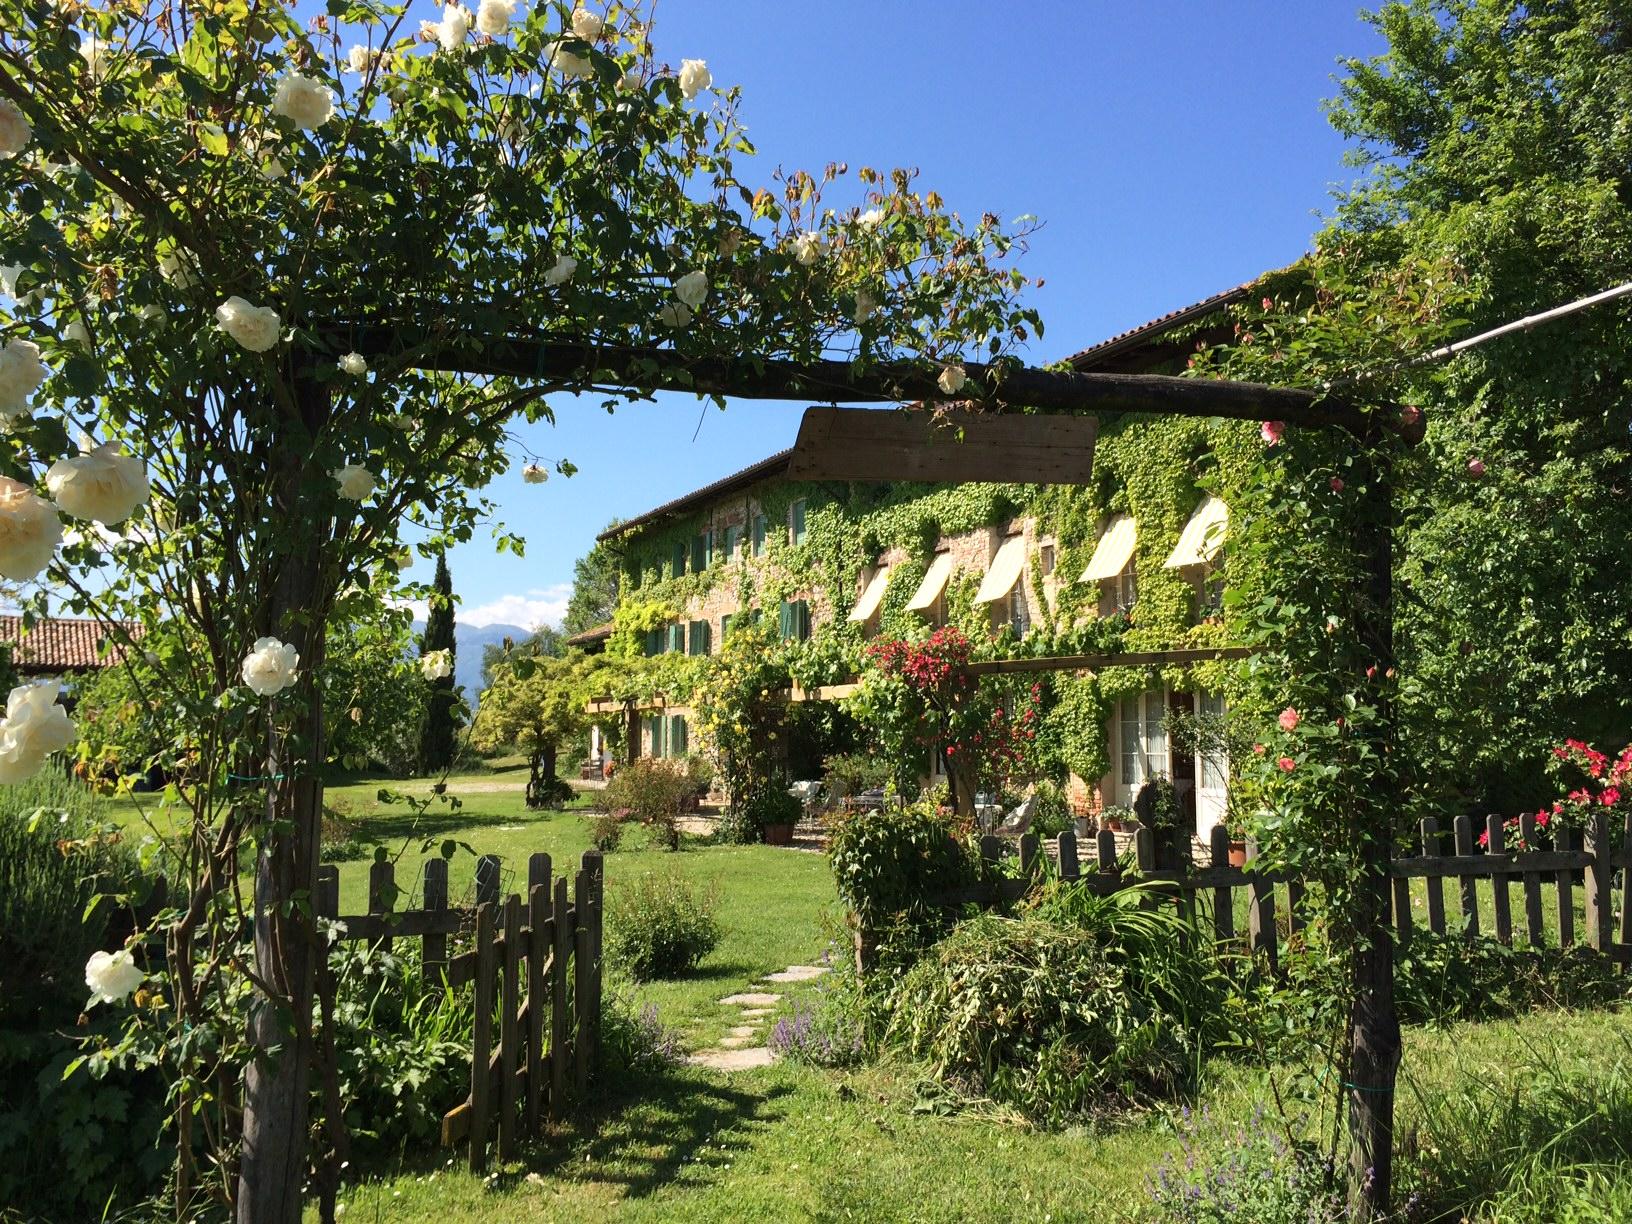 Arredamento Shabby Toscana agriturismo di charme | shabby chic mania by grazia maiolino